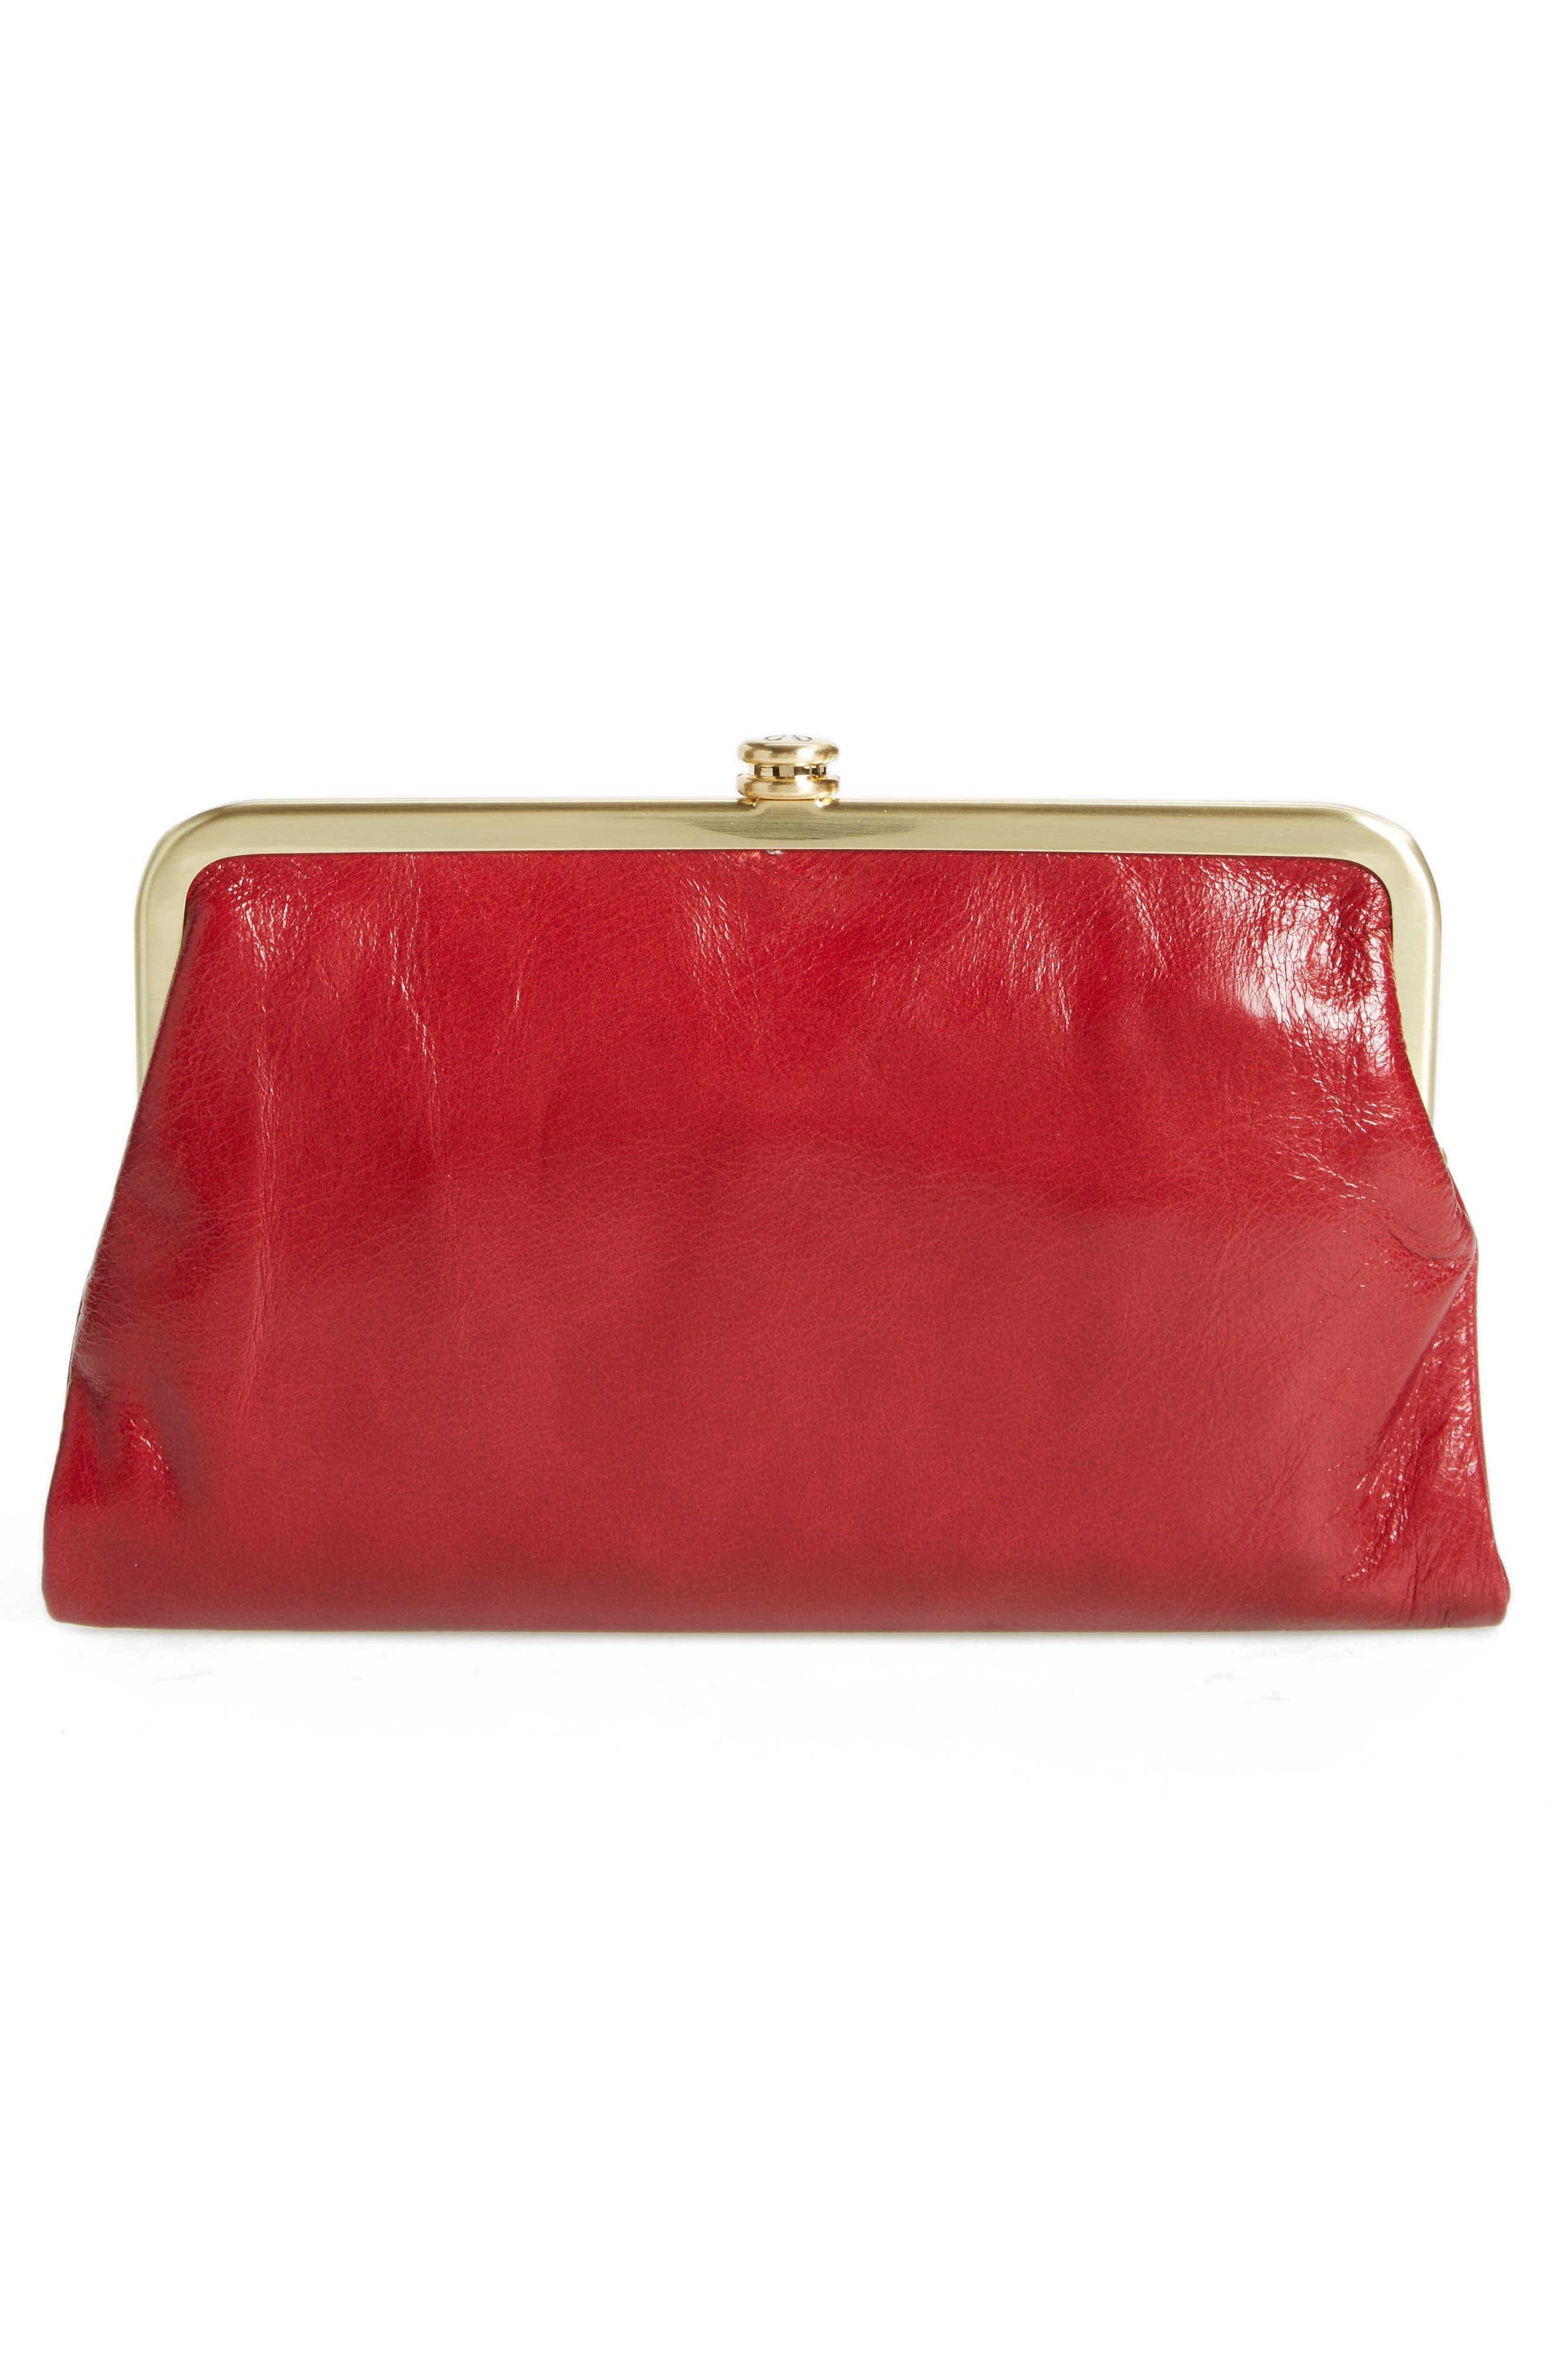 Suzette Calfskin Leather Wallet,                             Alternate thumbnail 3, color,                             Cardinal